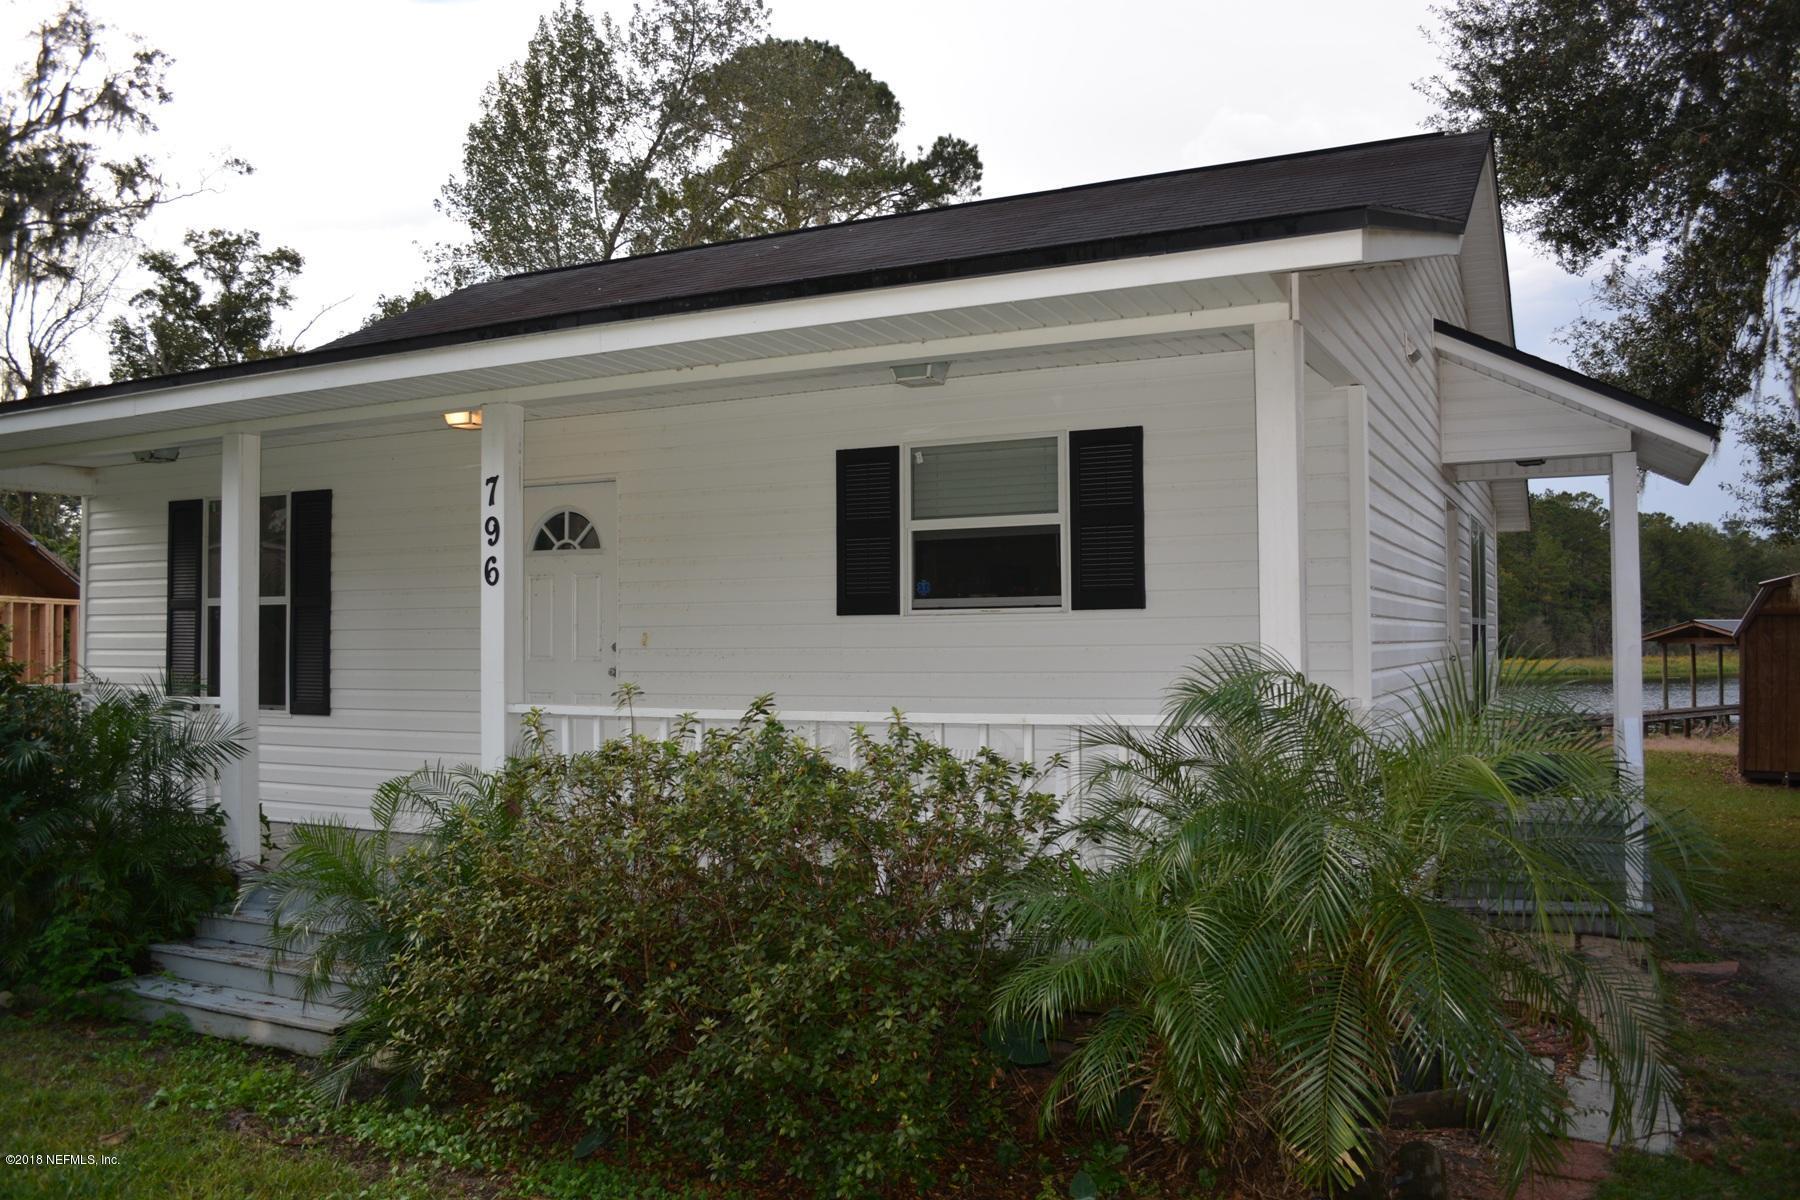 796 LAKE SHORE, INTERLACHEN, FLORIDA 32148, 2 Bedrooms Bedrooms, ,1 BathroomBathrooms,Residential - single family,For sale,LAKE SHORE,966711